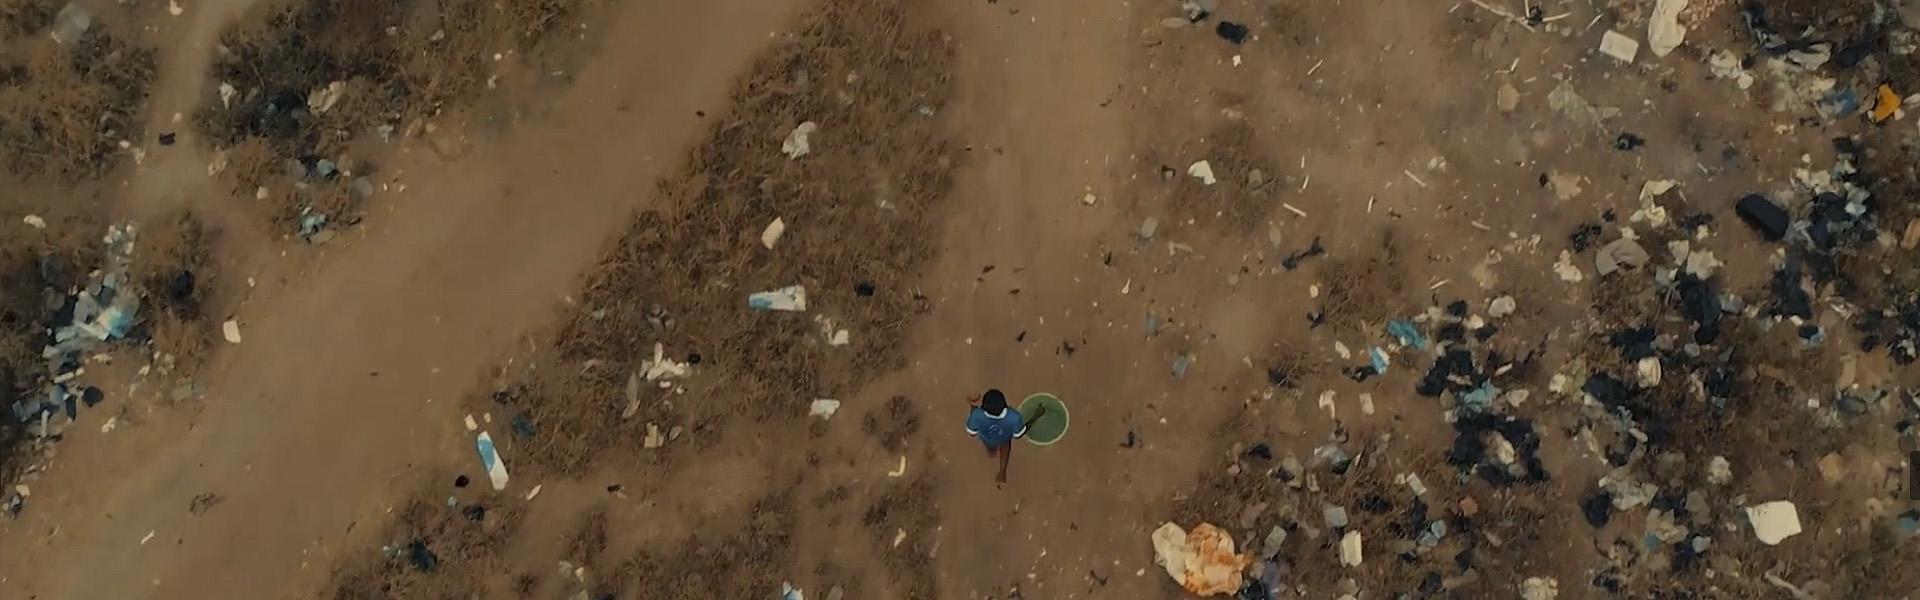 Foto principal oro que empobrece, agua que mata